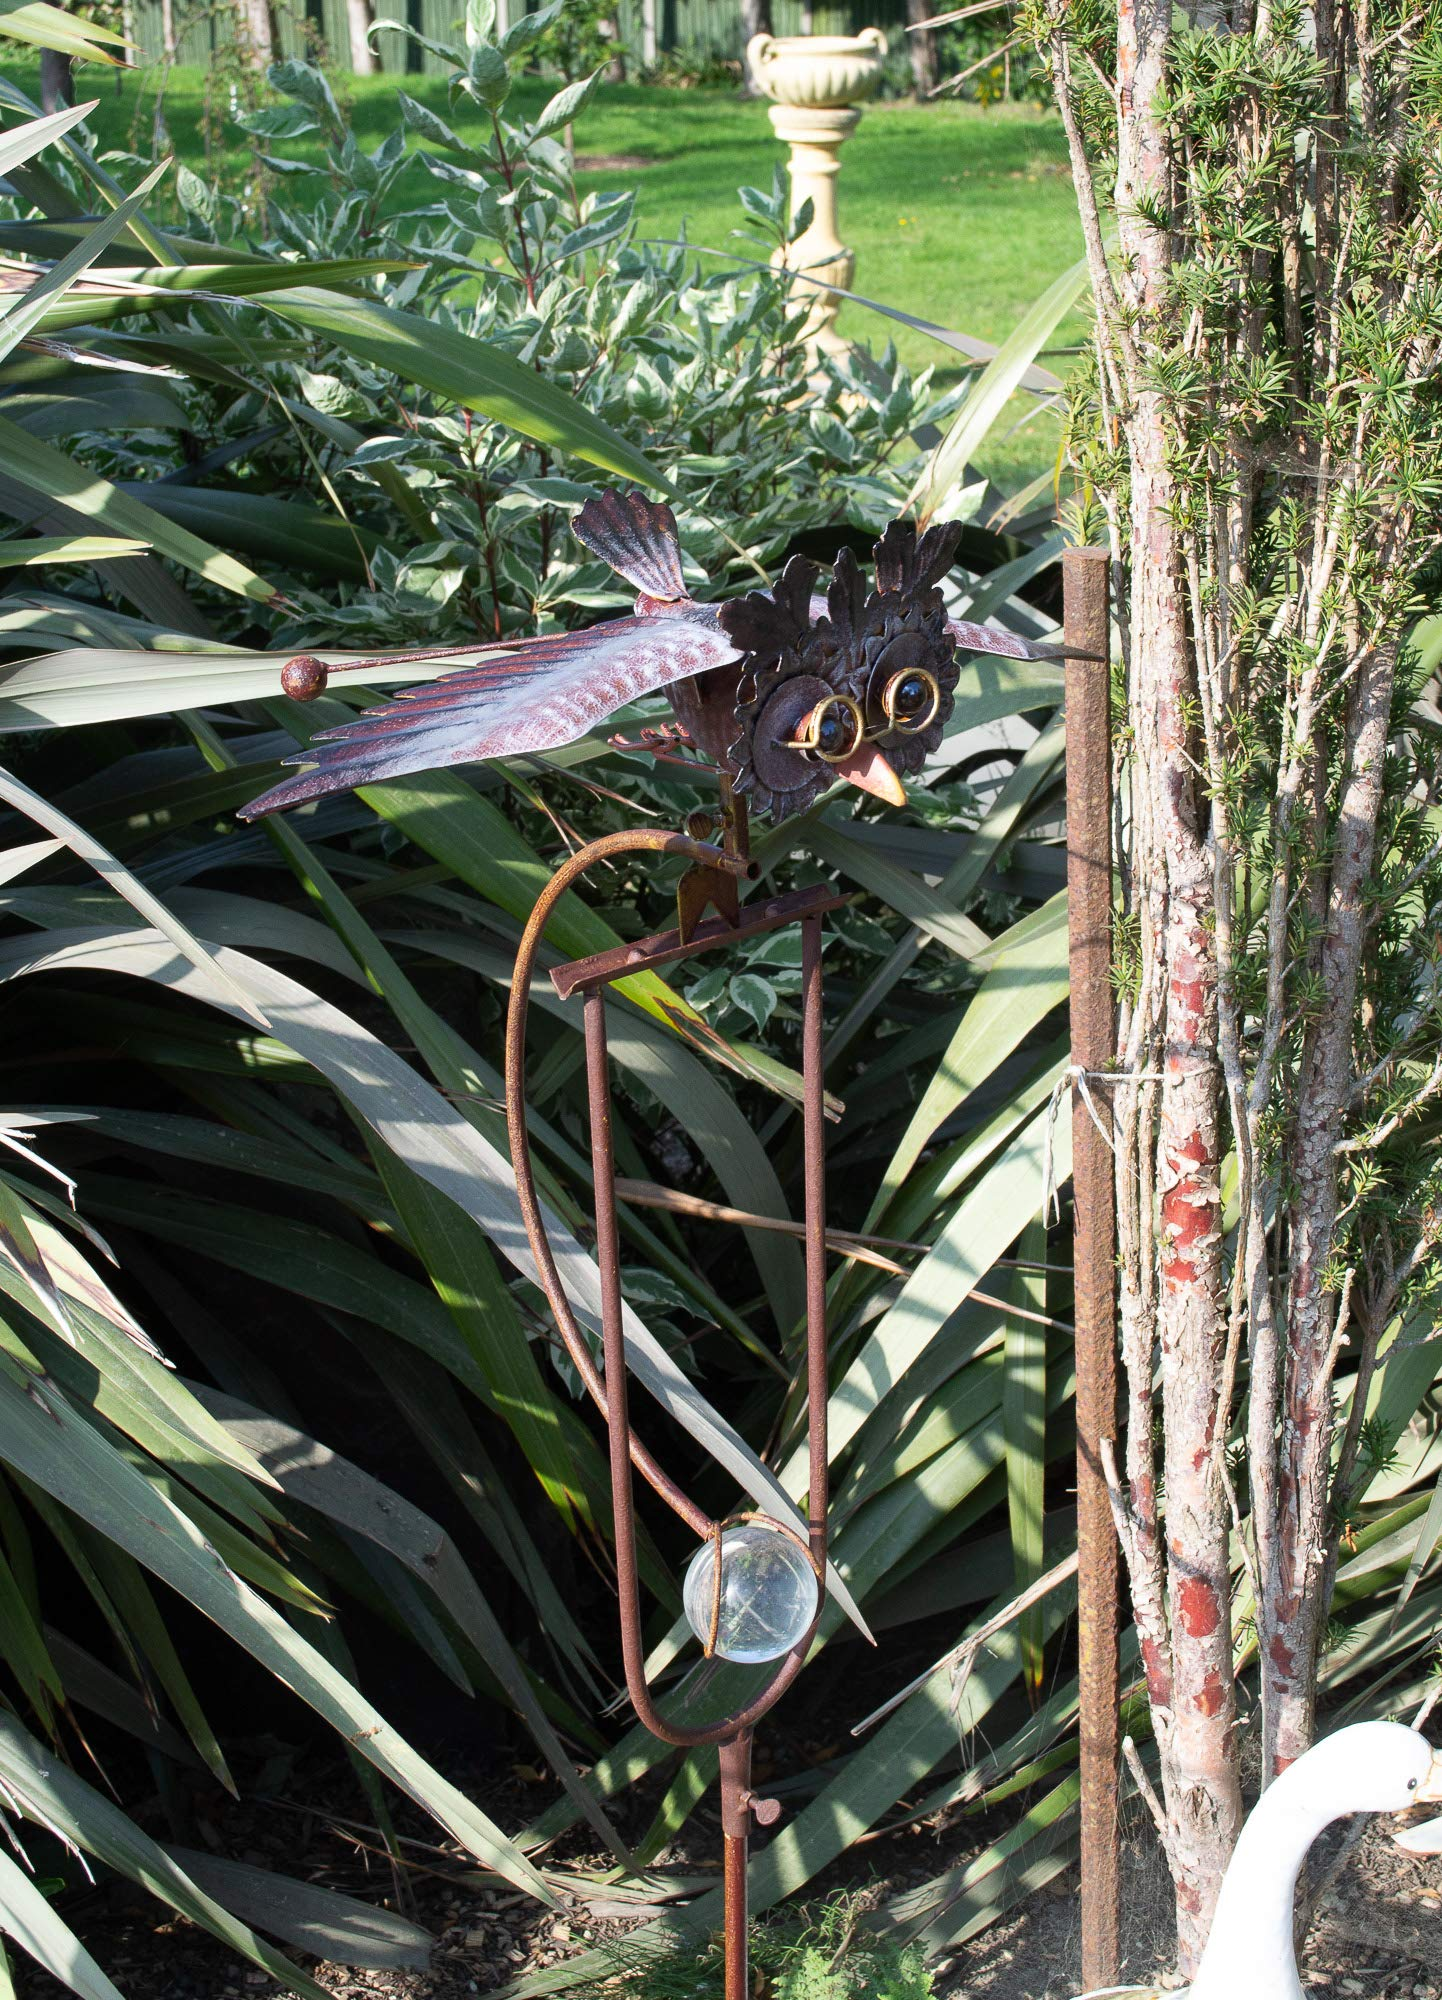 east2eden Rocking Balancing Flying Owl or Crow Metal Garden Wind Rocker Spinner Ornament e2e Rocking Owl